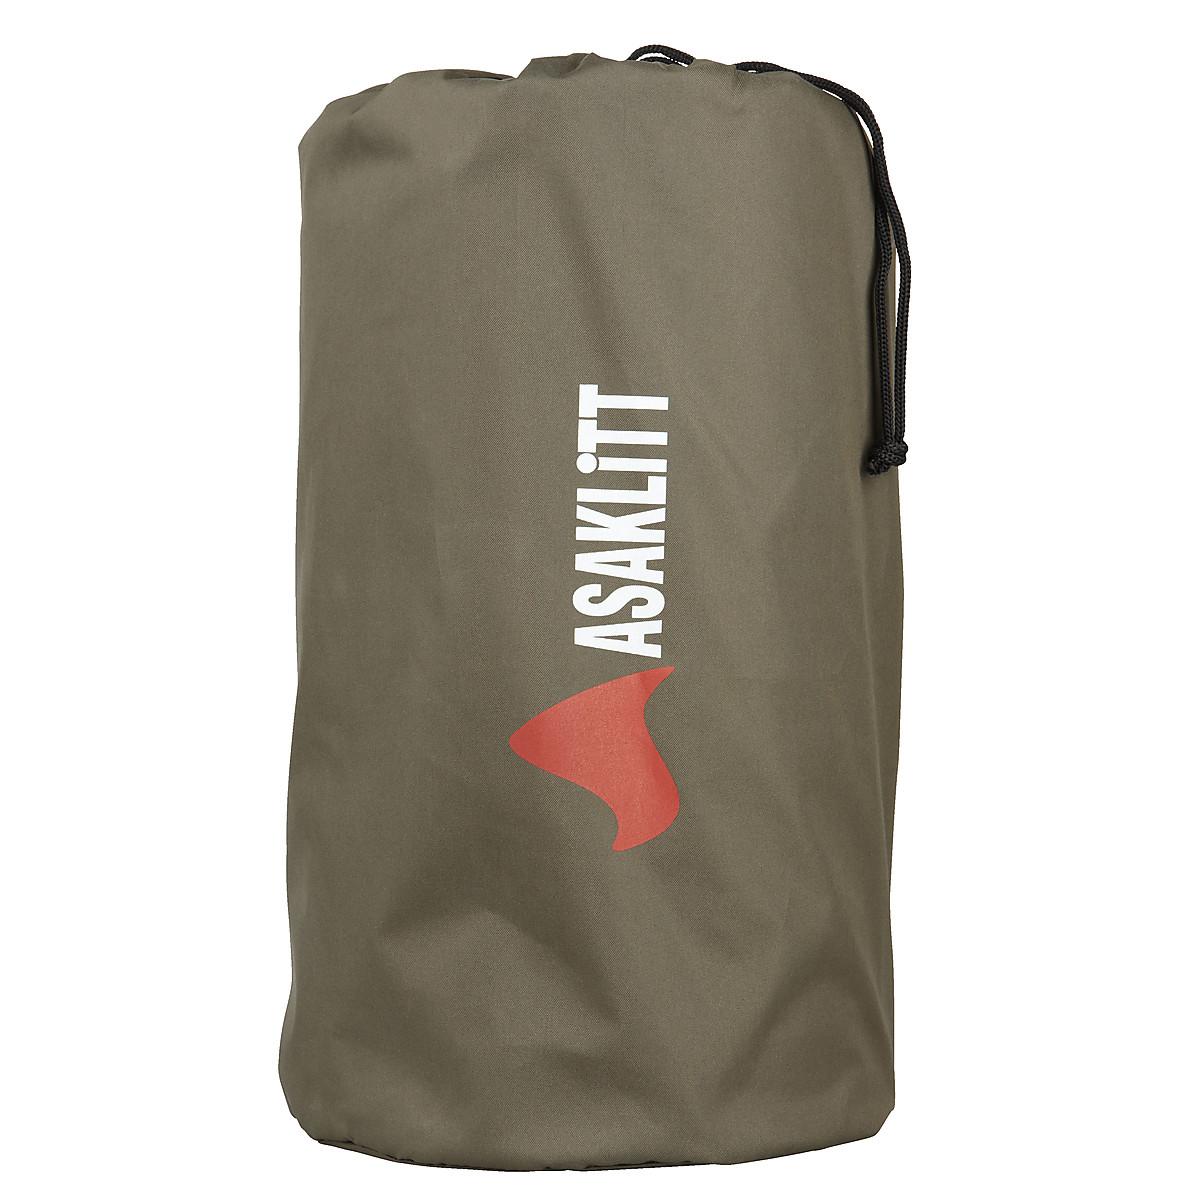 Asaklitt Self-Inflating Camping Mattress